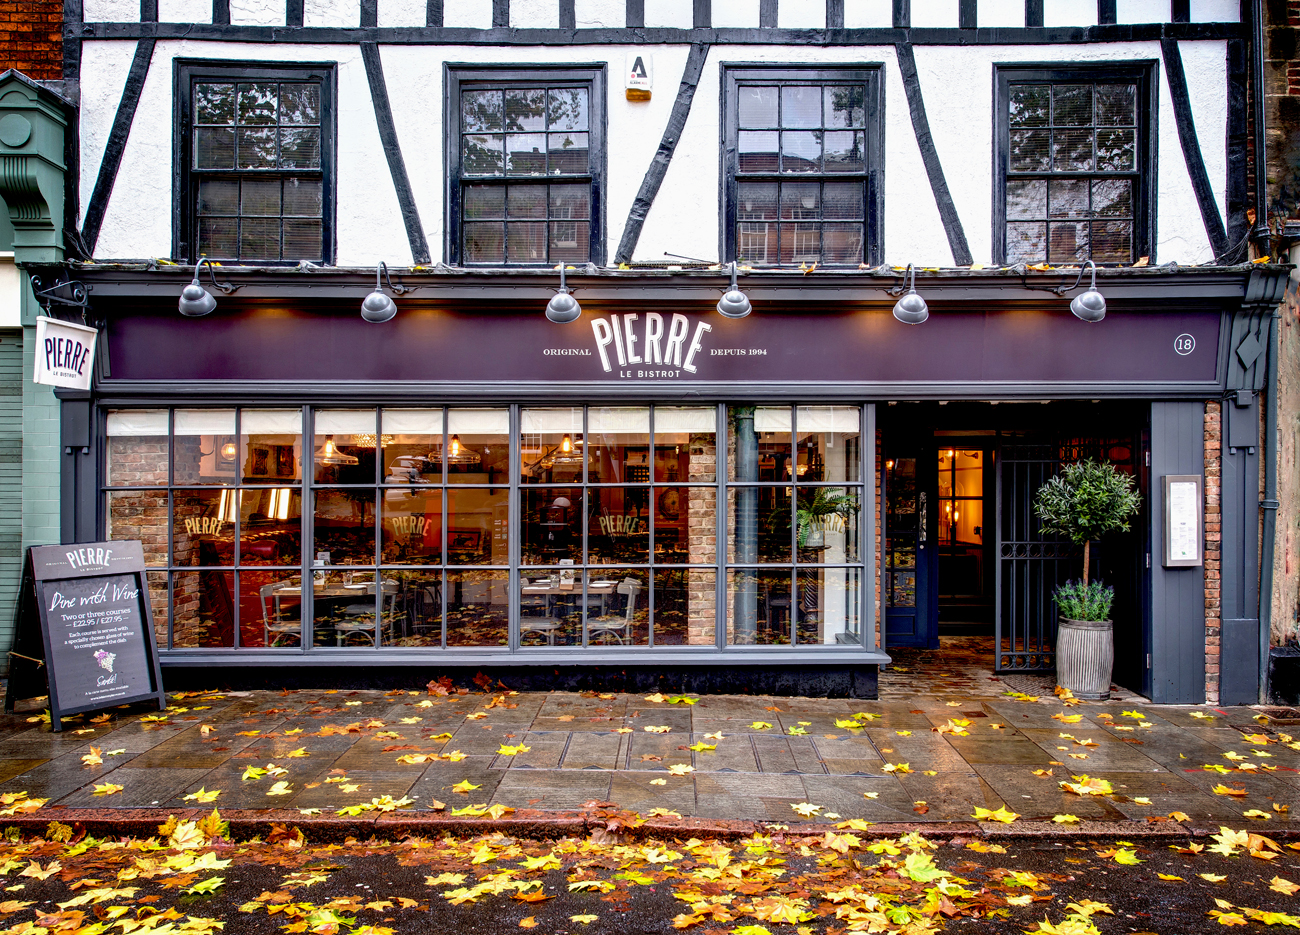 Restaurant Review: Le Bistrot Pierre, Friargate, Derby